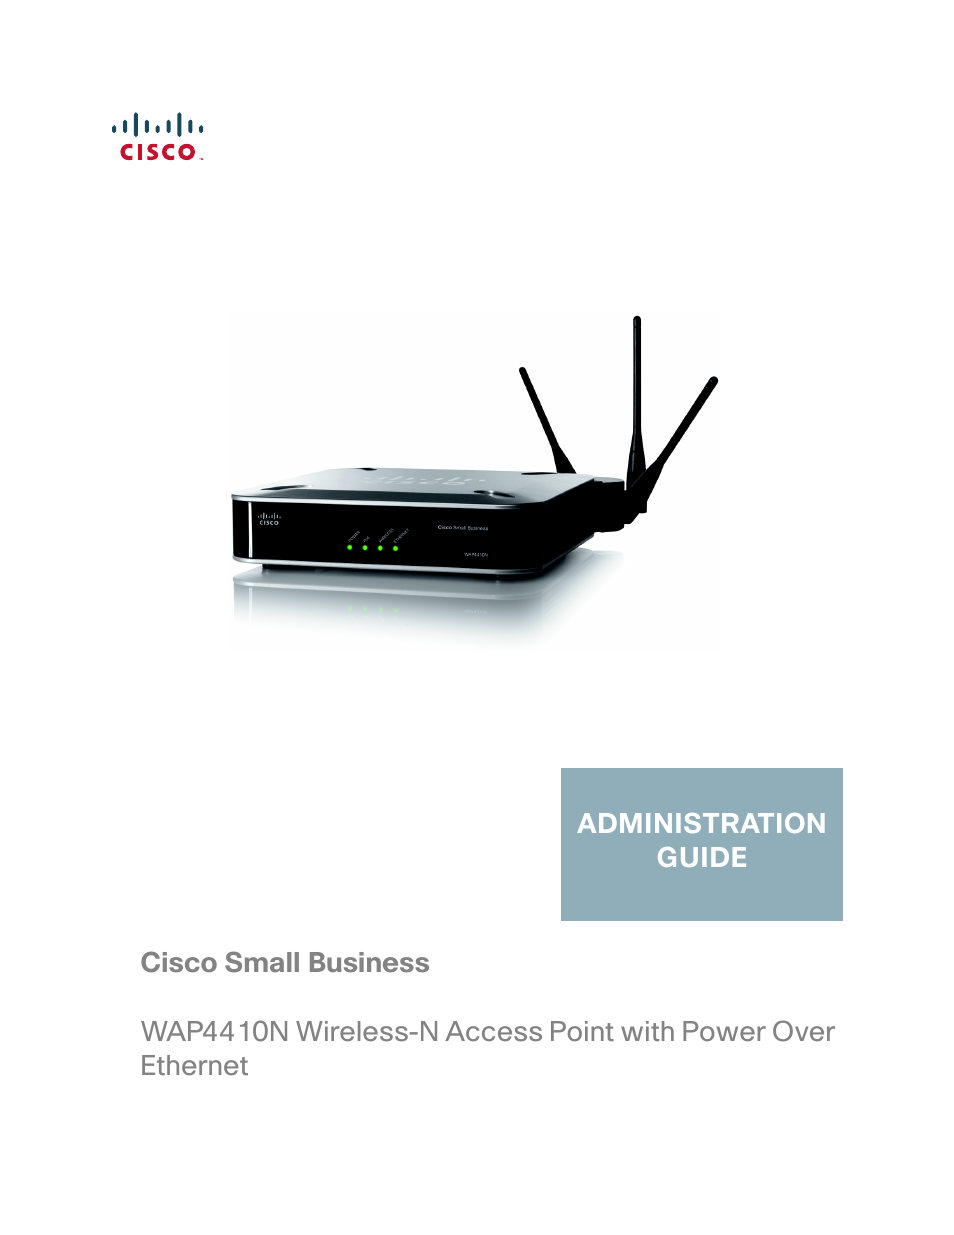 cisco wireless access point wap4410n user manual 62 pages rh manualsdir com cisco wap4410n manuale italiano cisco wap4410n manual download